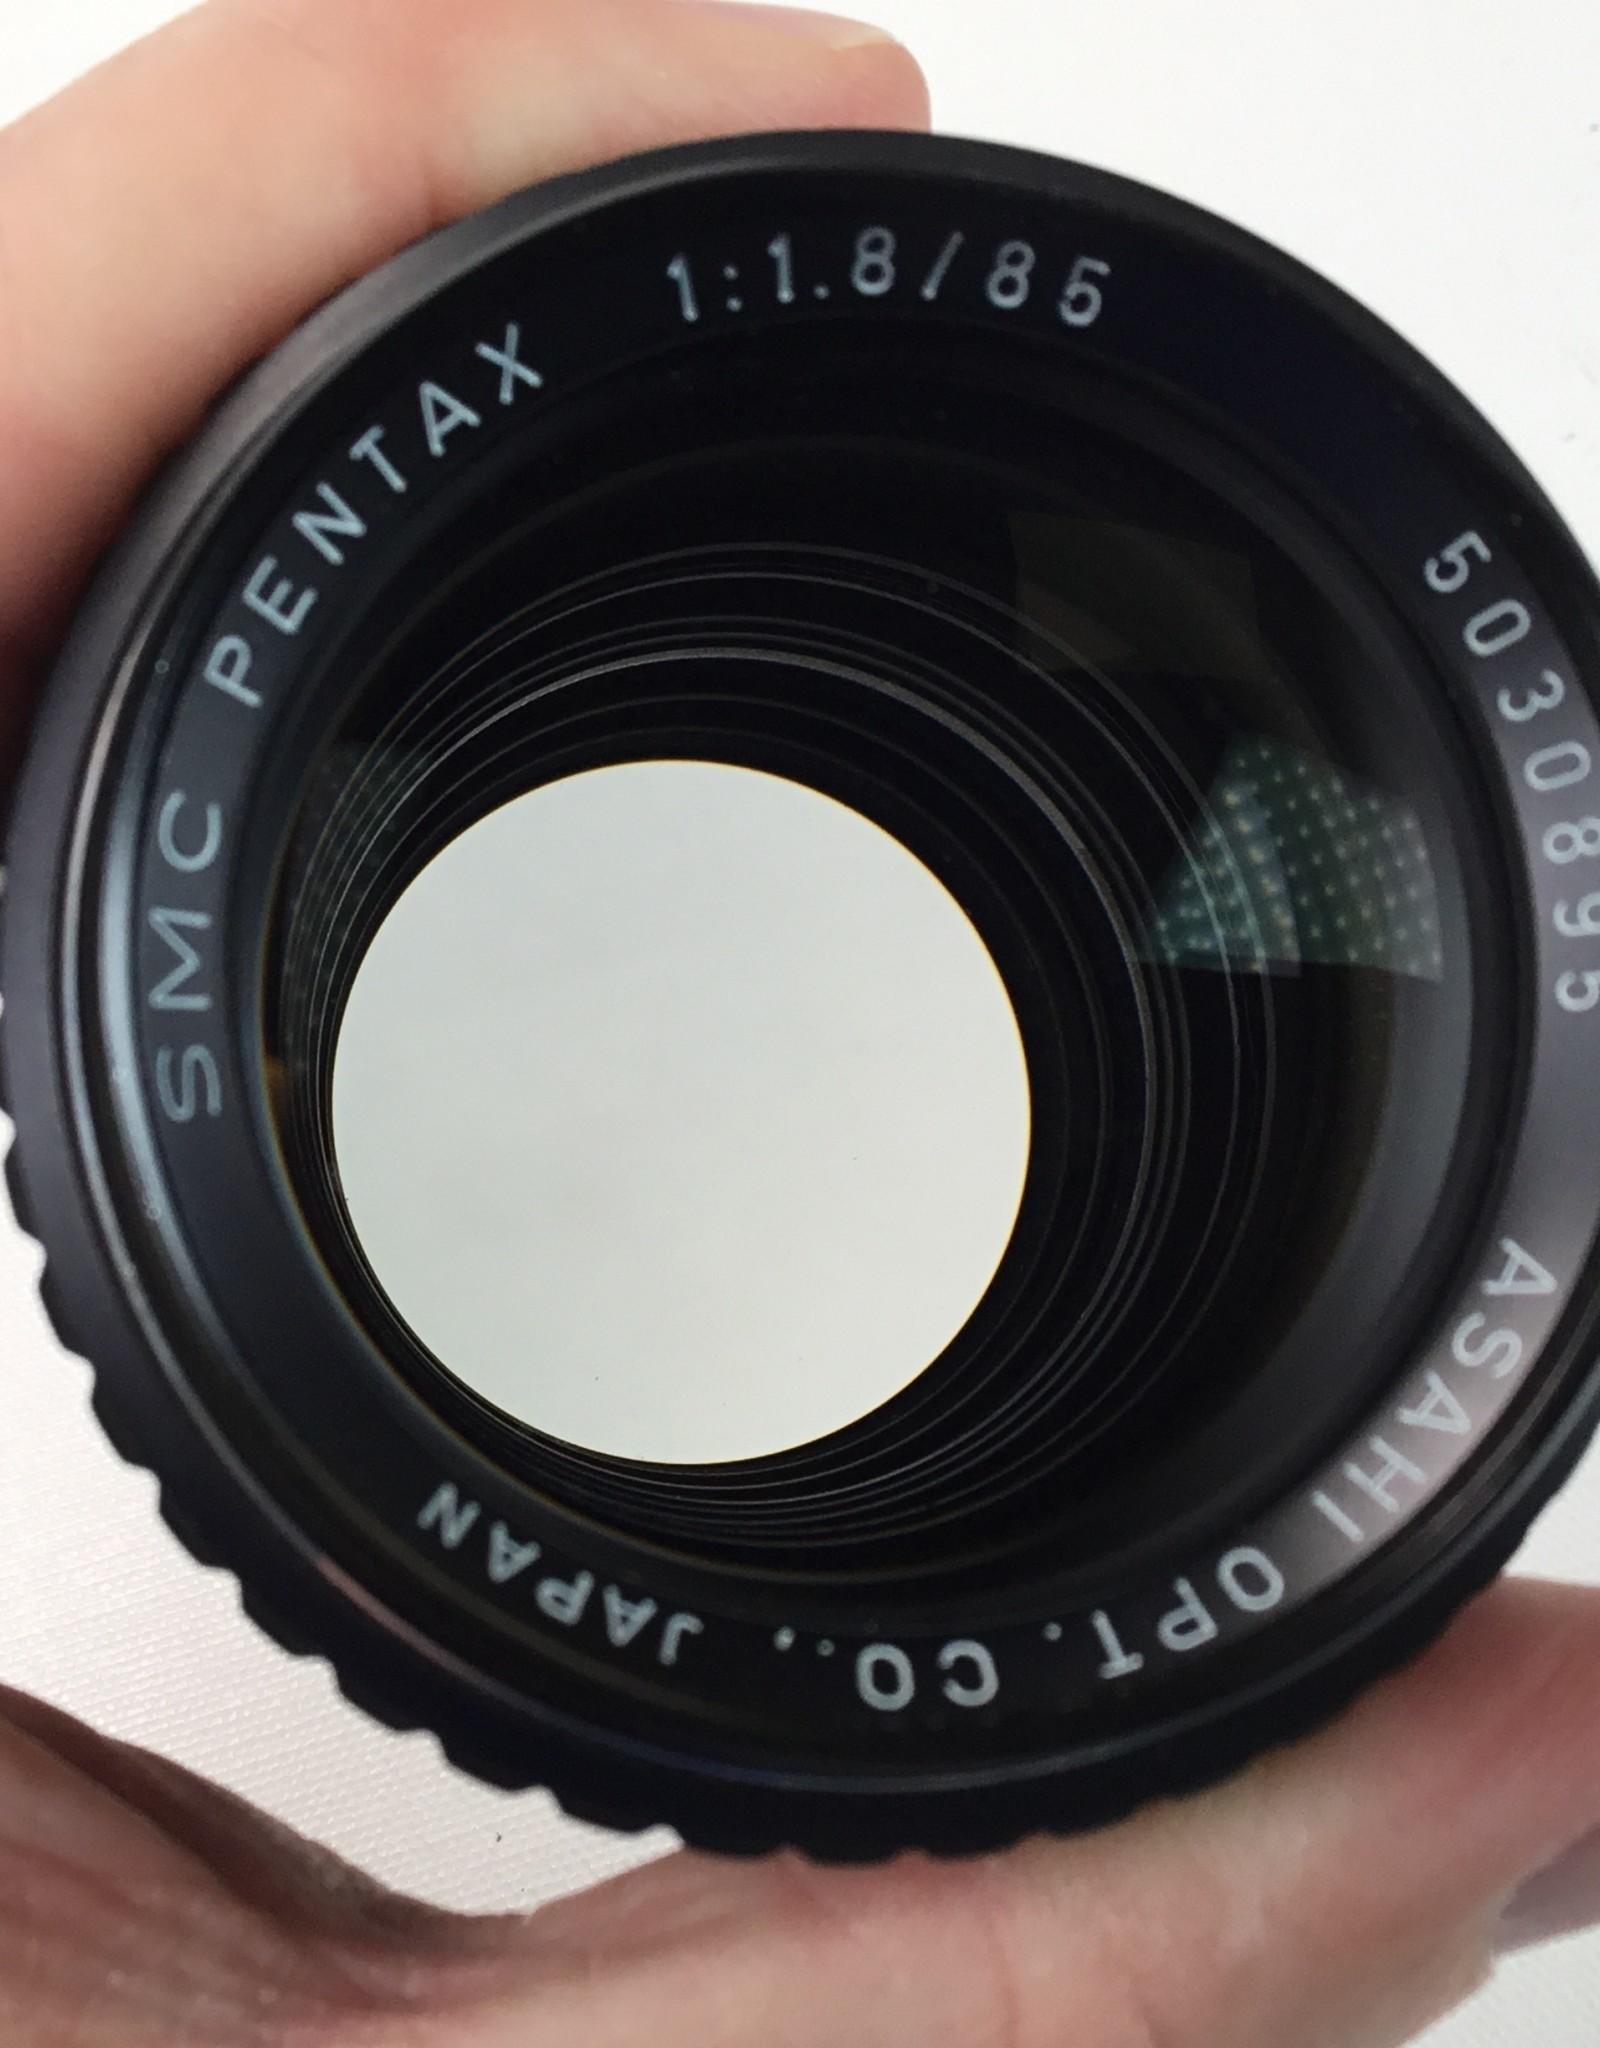 Pentax Pentax SMC 85mm f1.8 Lens Used EX-